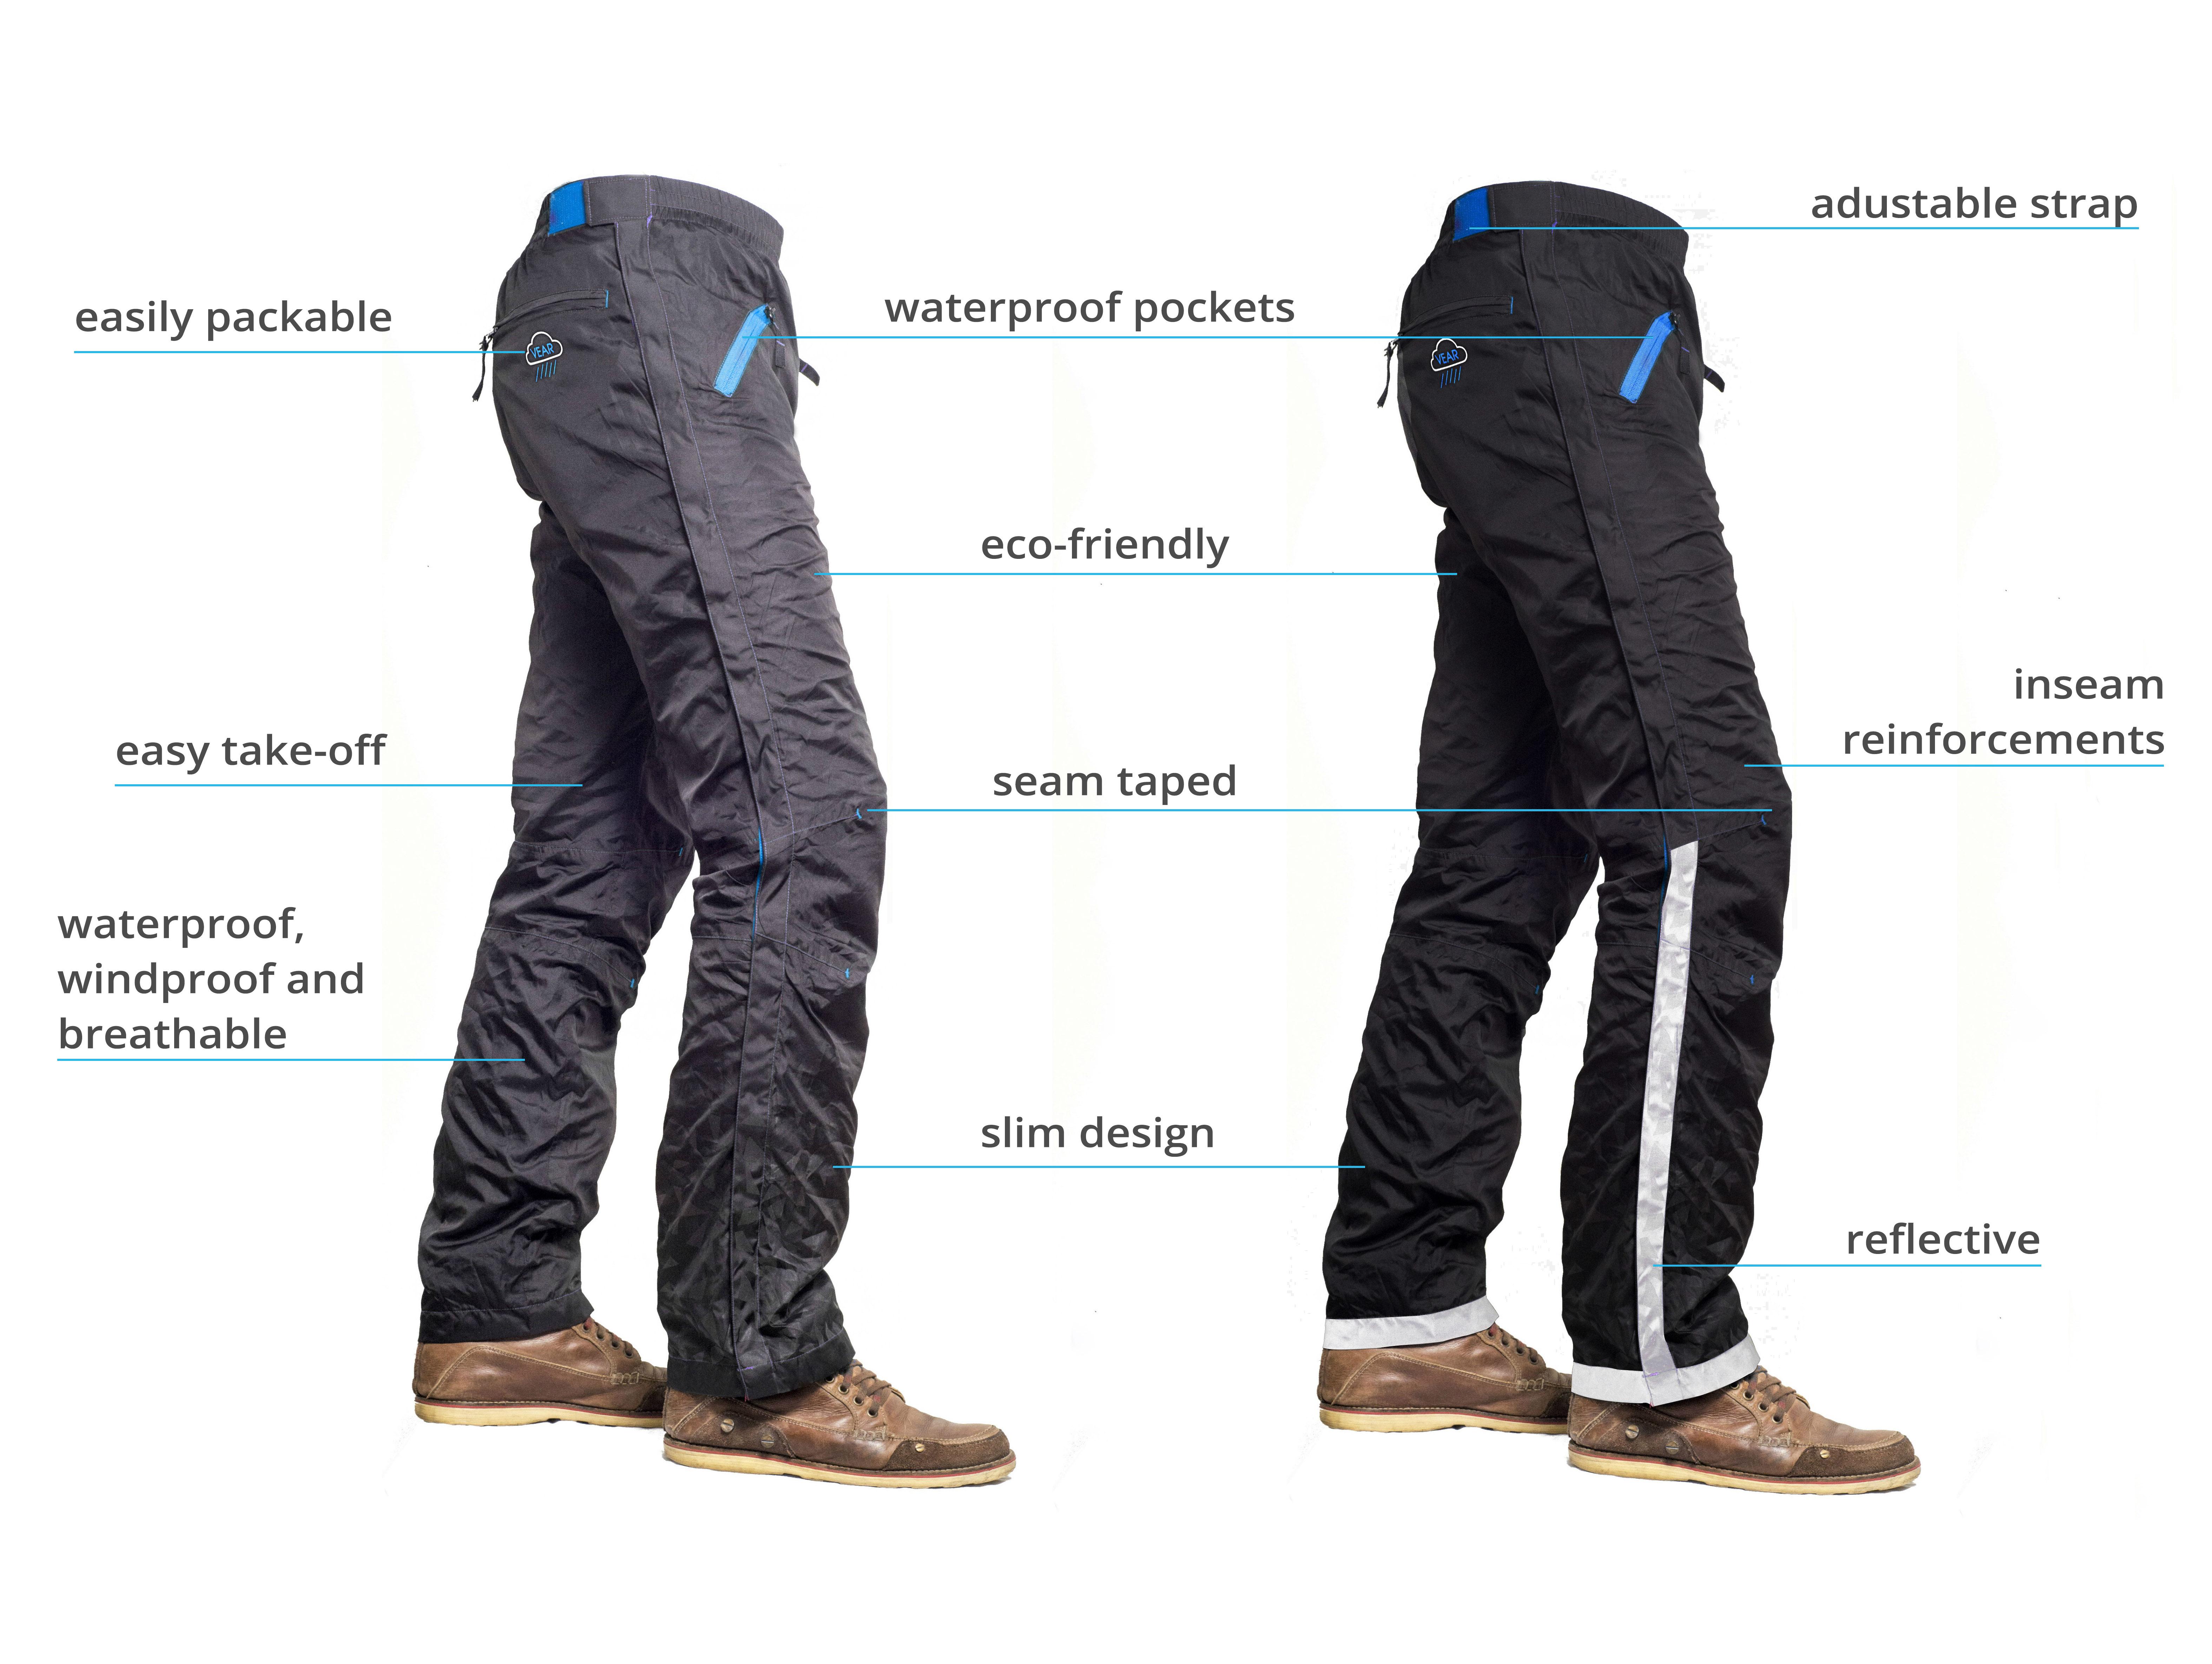 how to keep feet dry in rain